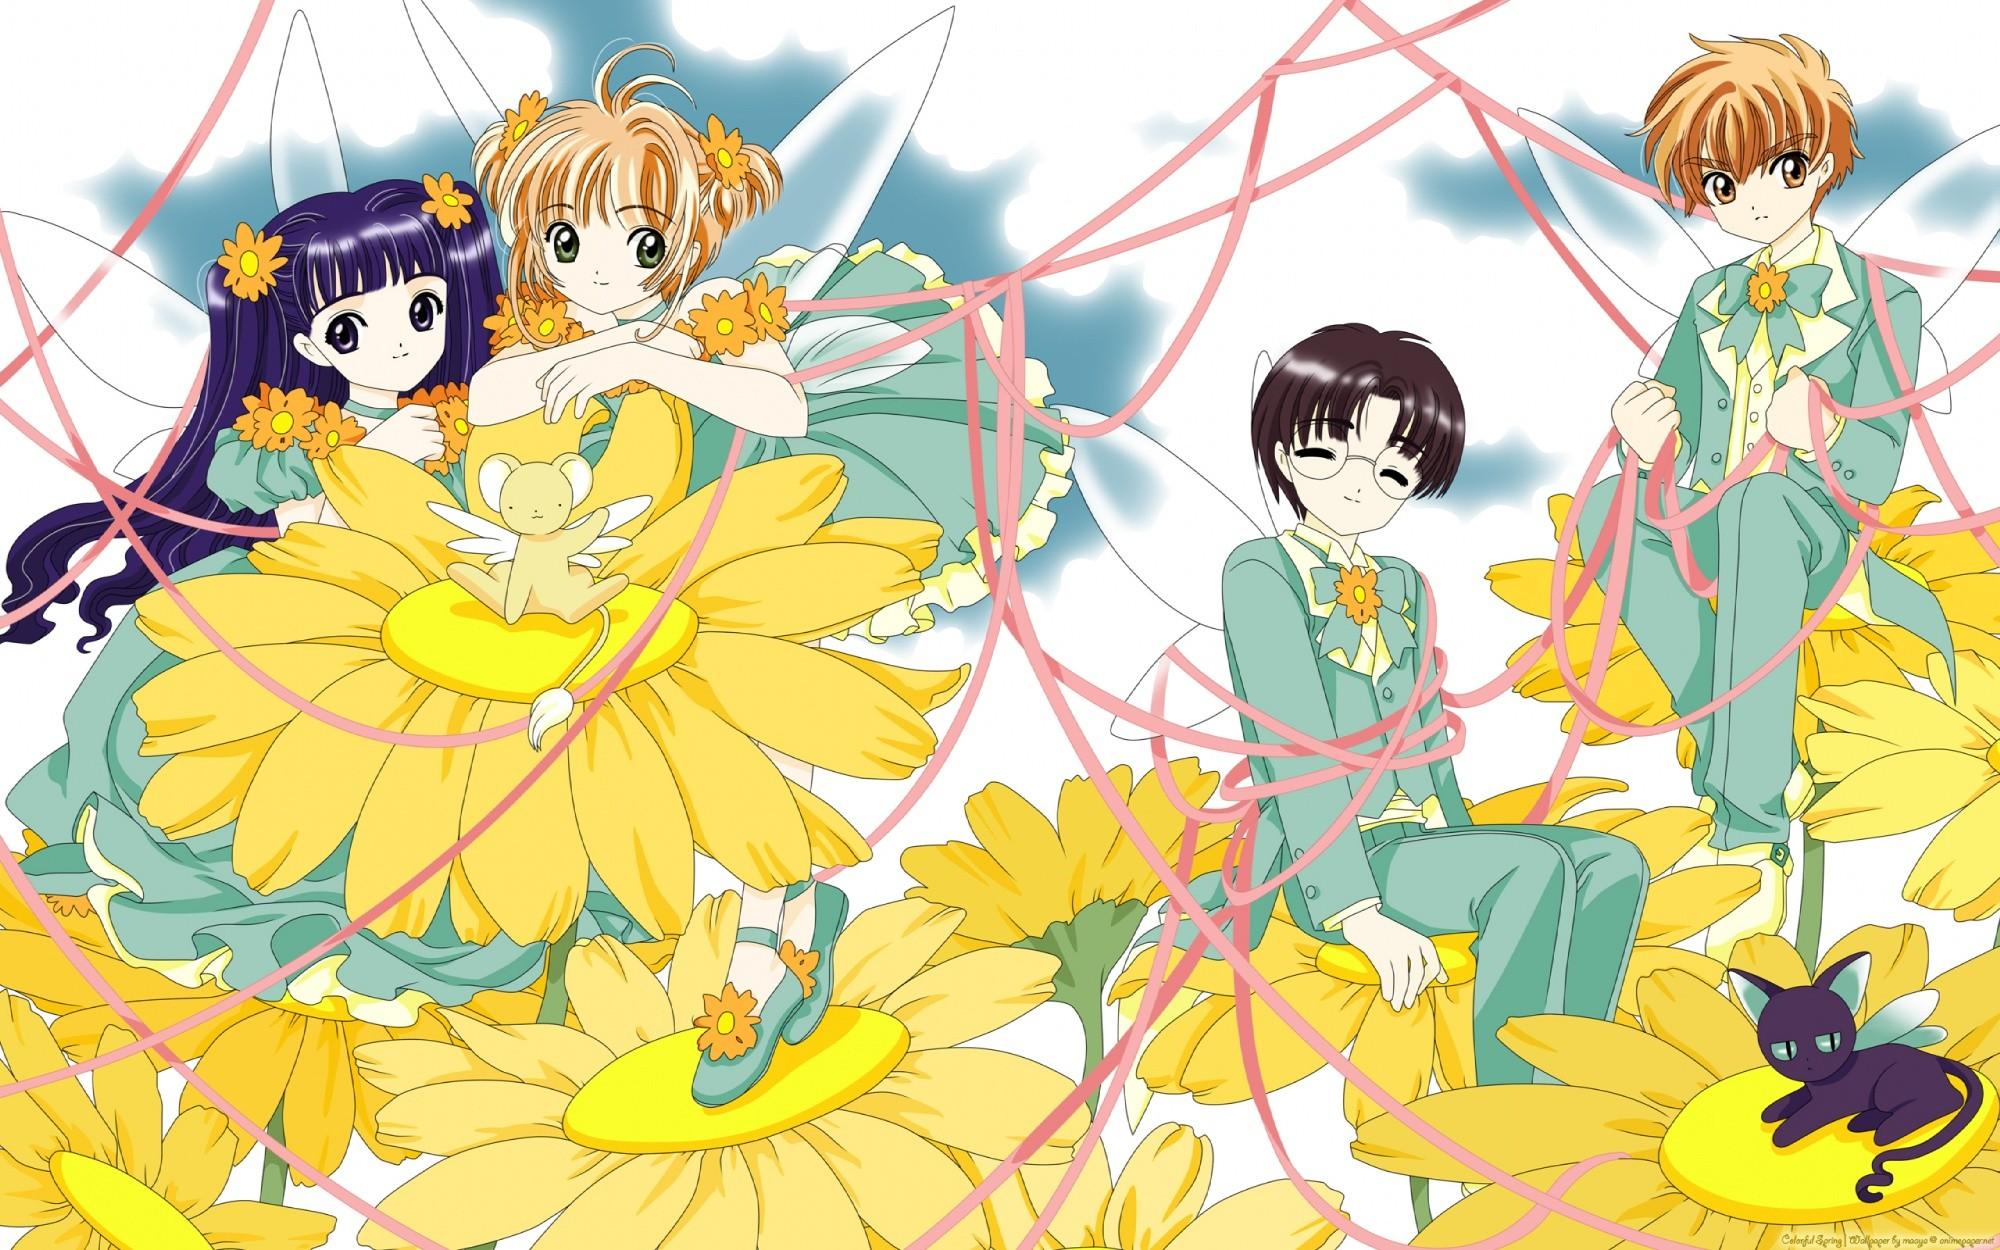 Cardcaptor sakura illustrations collection 2 hd wallpaper - Cardcaptor sakura wallpaper ...